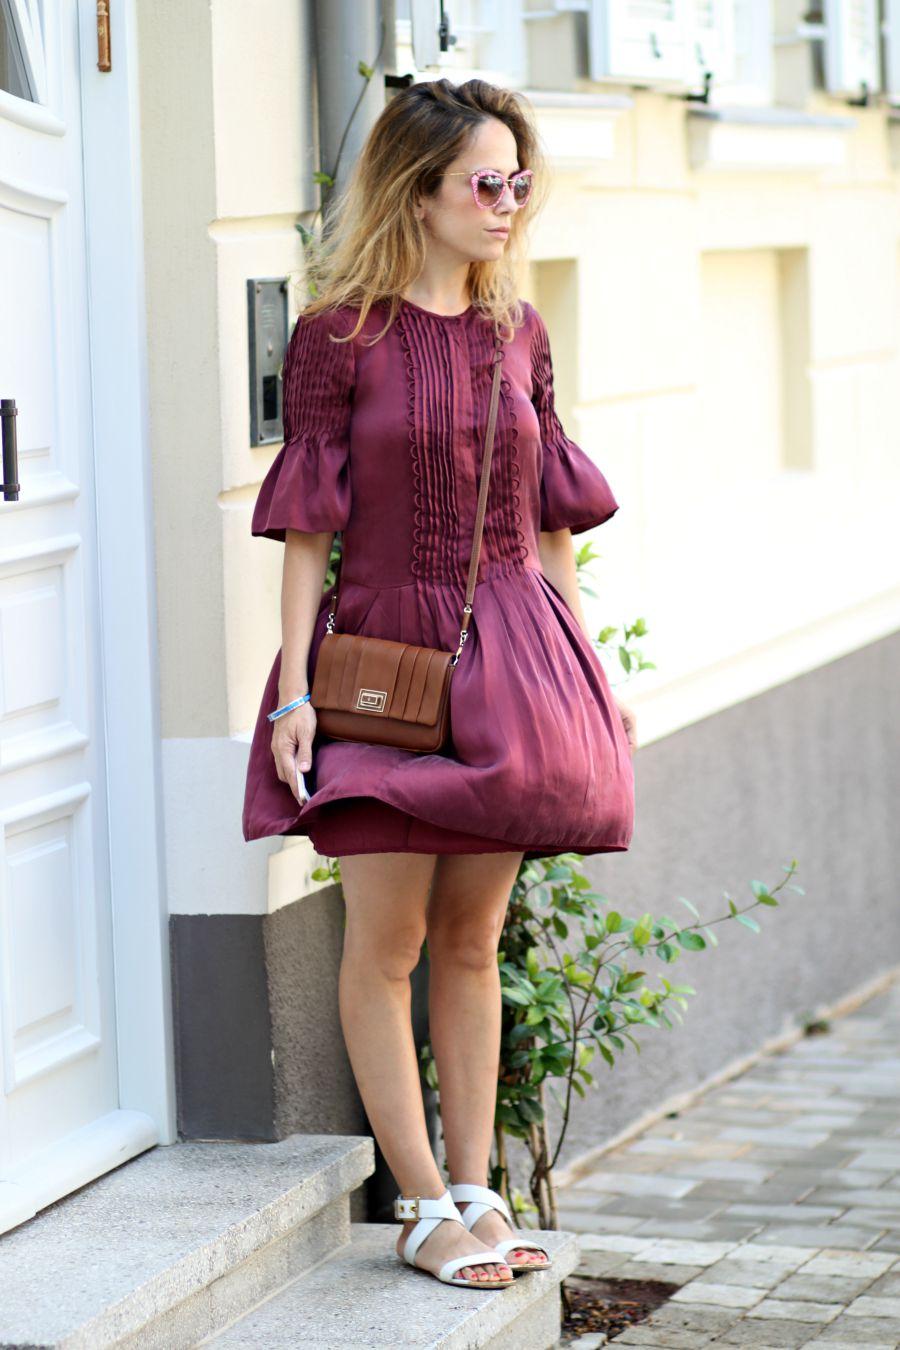 isabelmarant, satindress,daytimewear,ootd,fashionblog,telavivfashion,telavivstreetstyle,summer2015